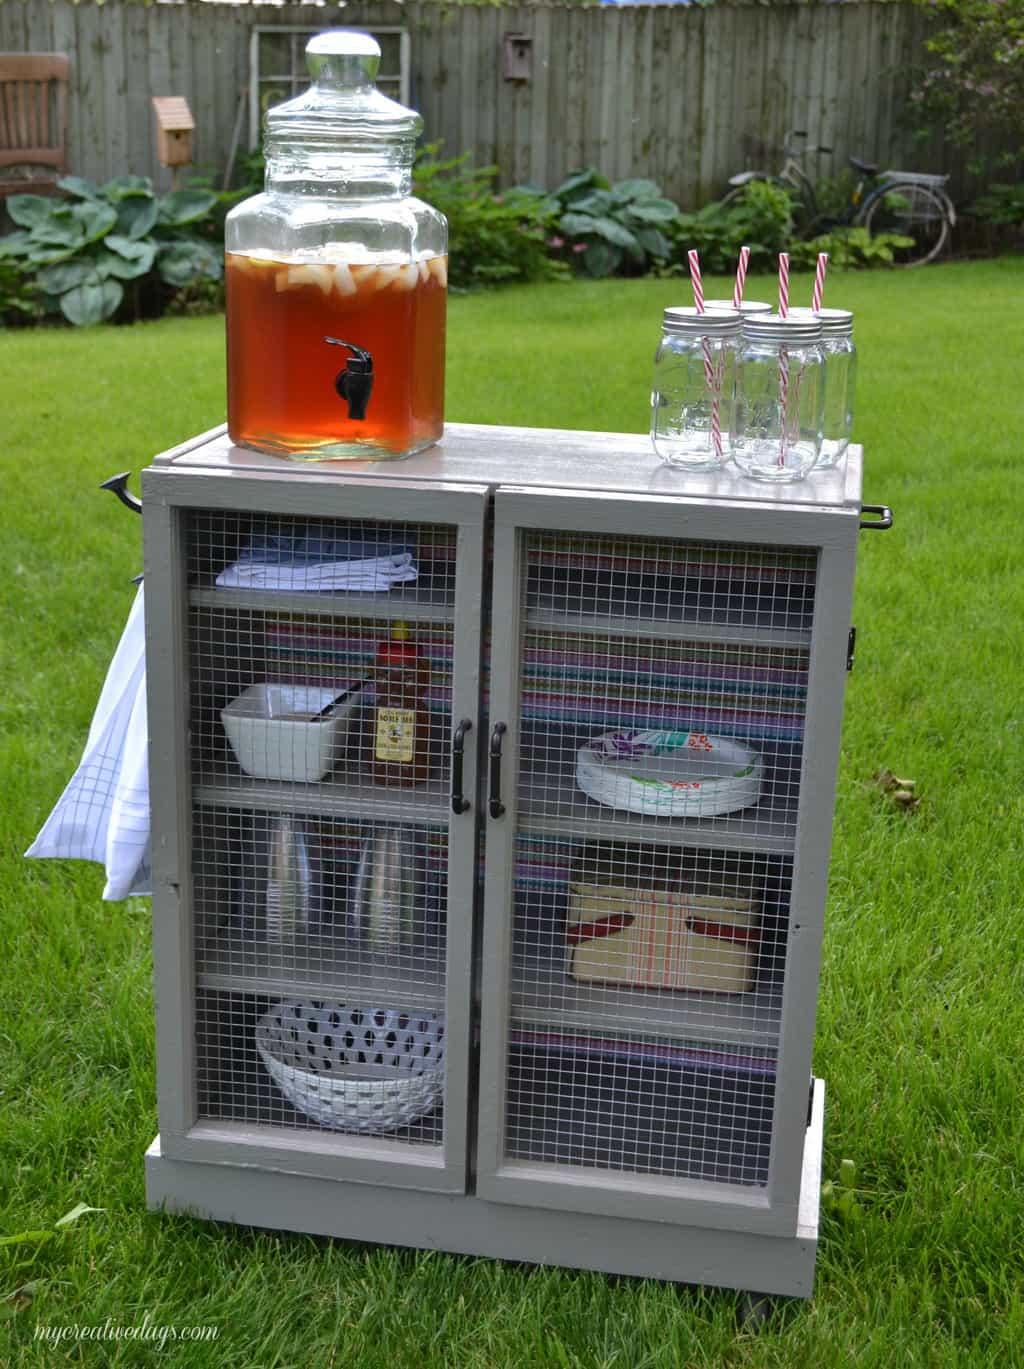 Ikea Hack - DIY Beverage Station mycreativedays.com